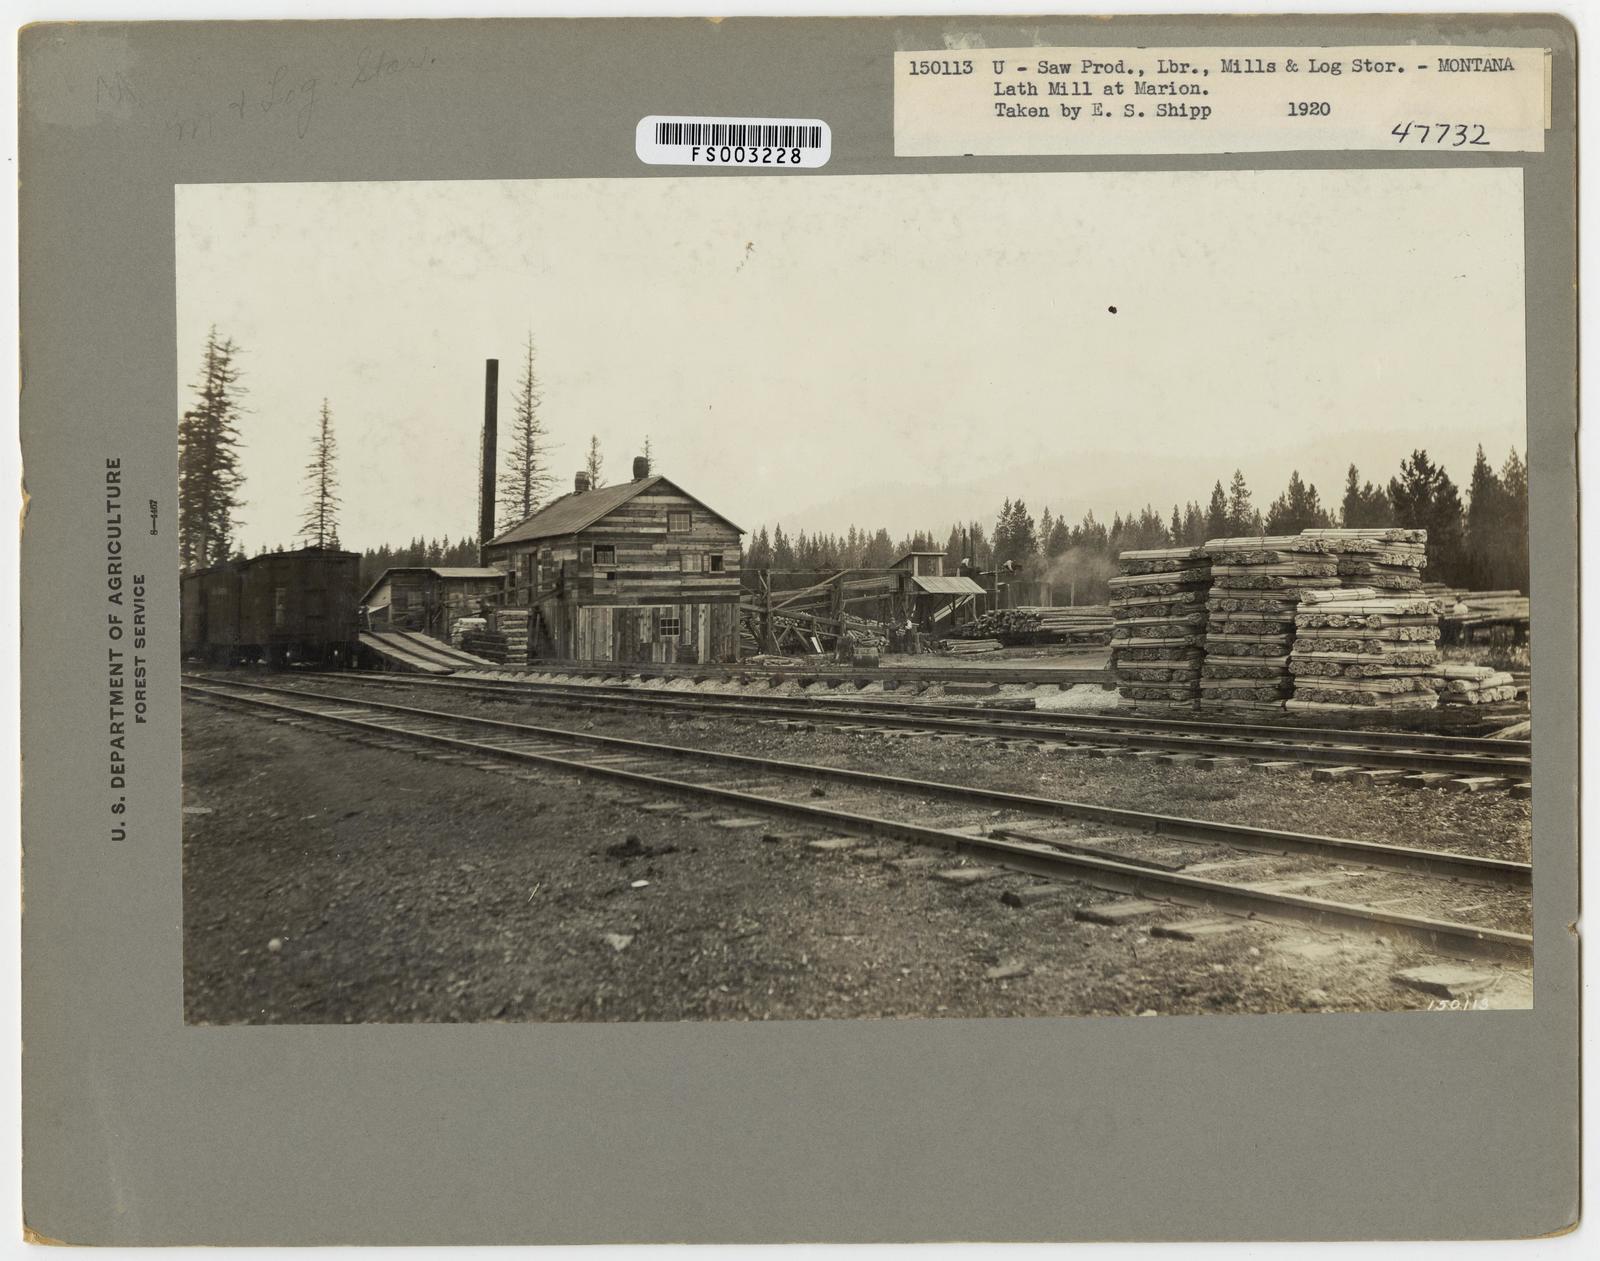 Seasoning and Shipping Lumber - Montana